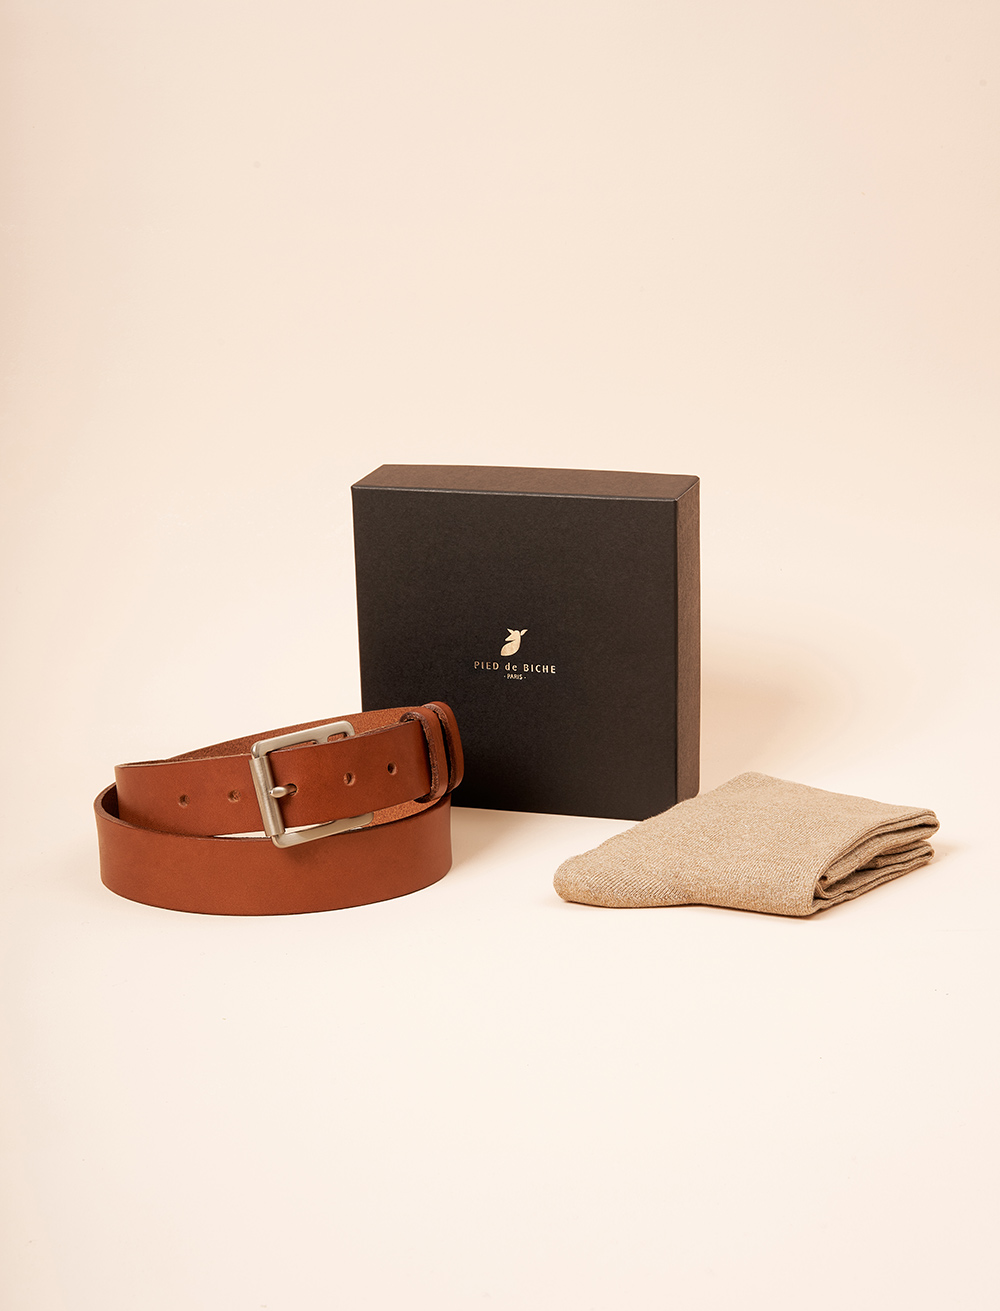 Christmas gift box - Raw belt and socks